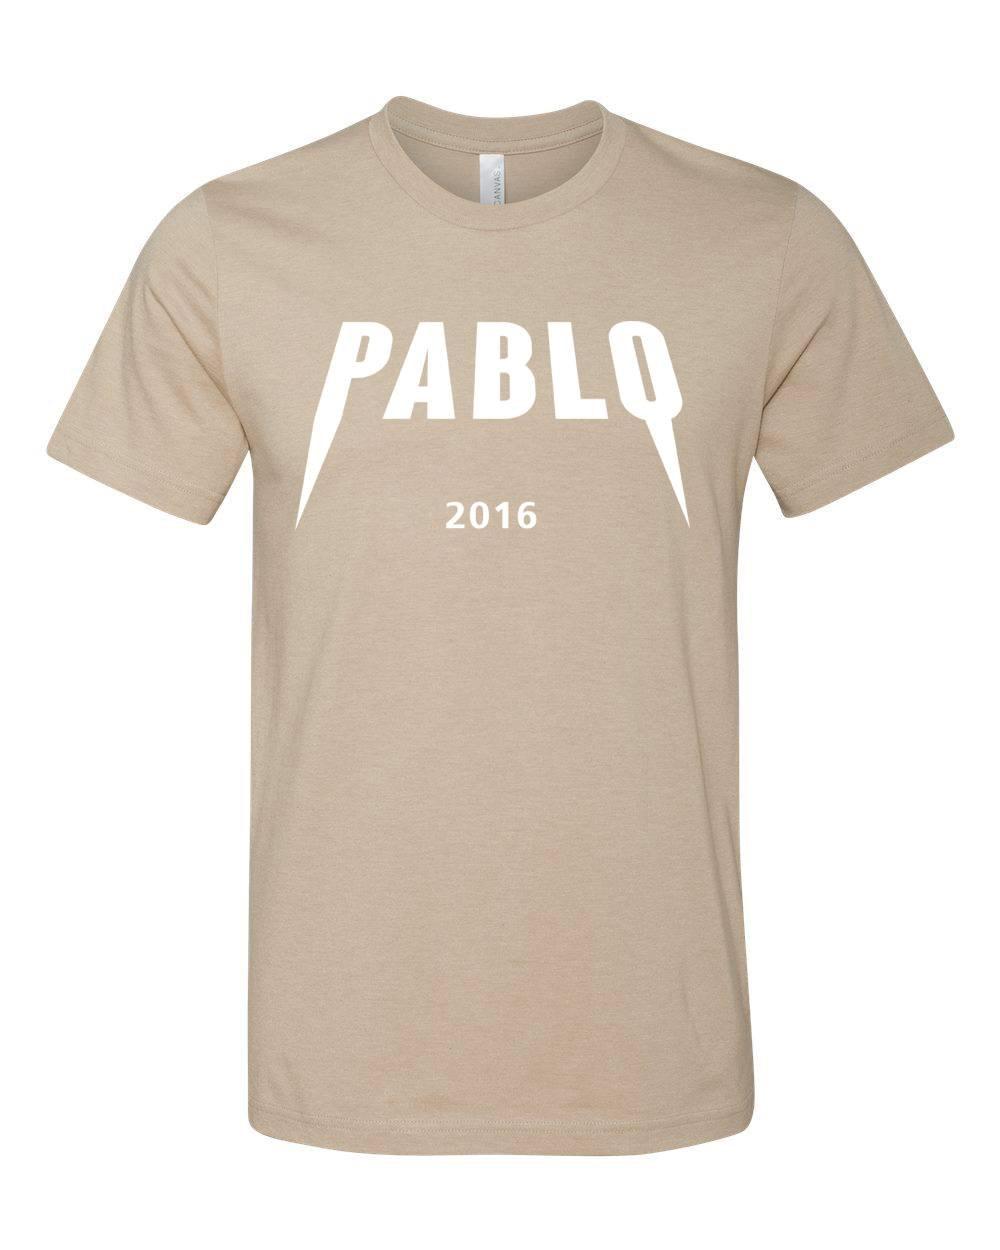 Yeezus Pablo T-shirt, Yeezy Season, Pablo Tee, kanye t-shirt